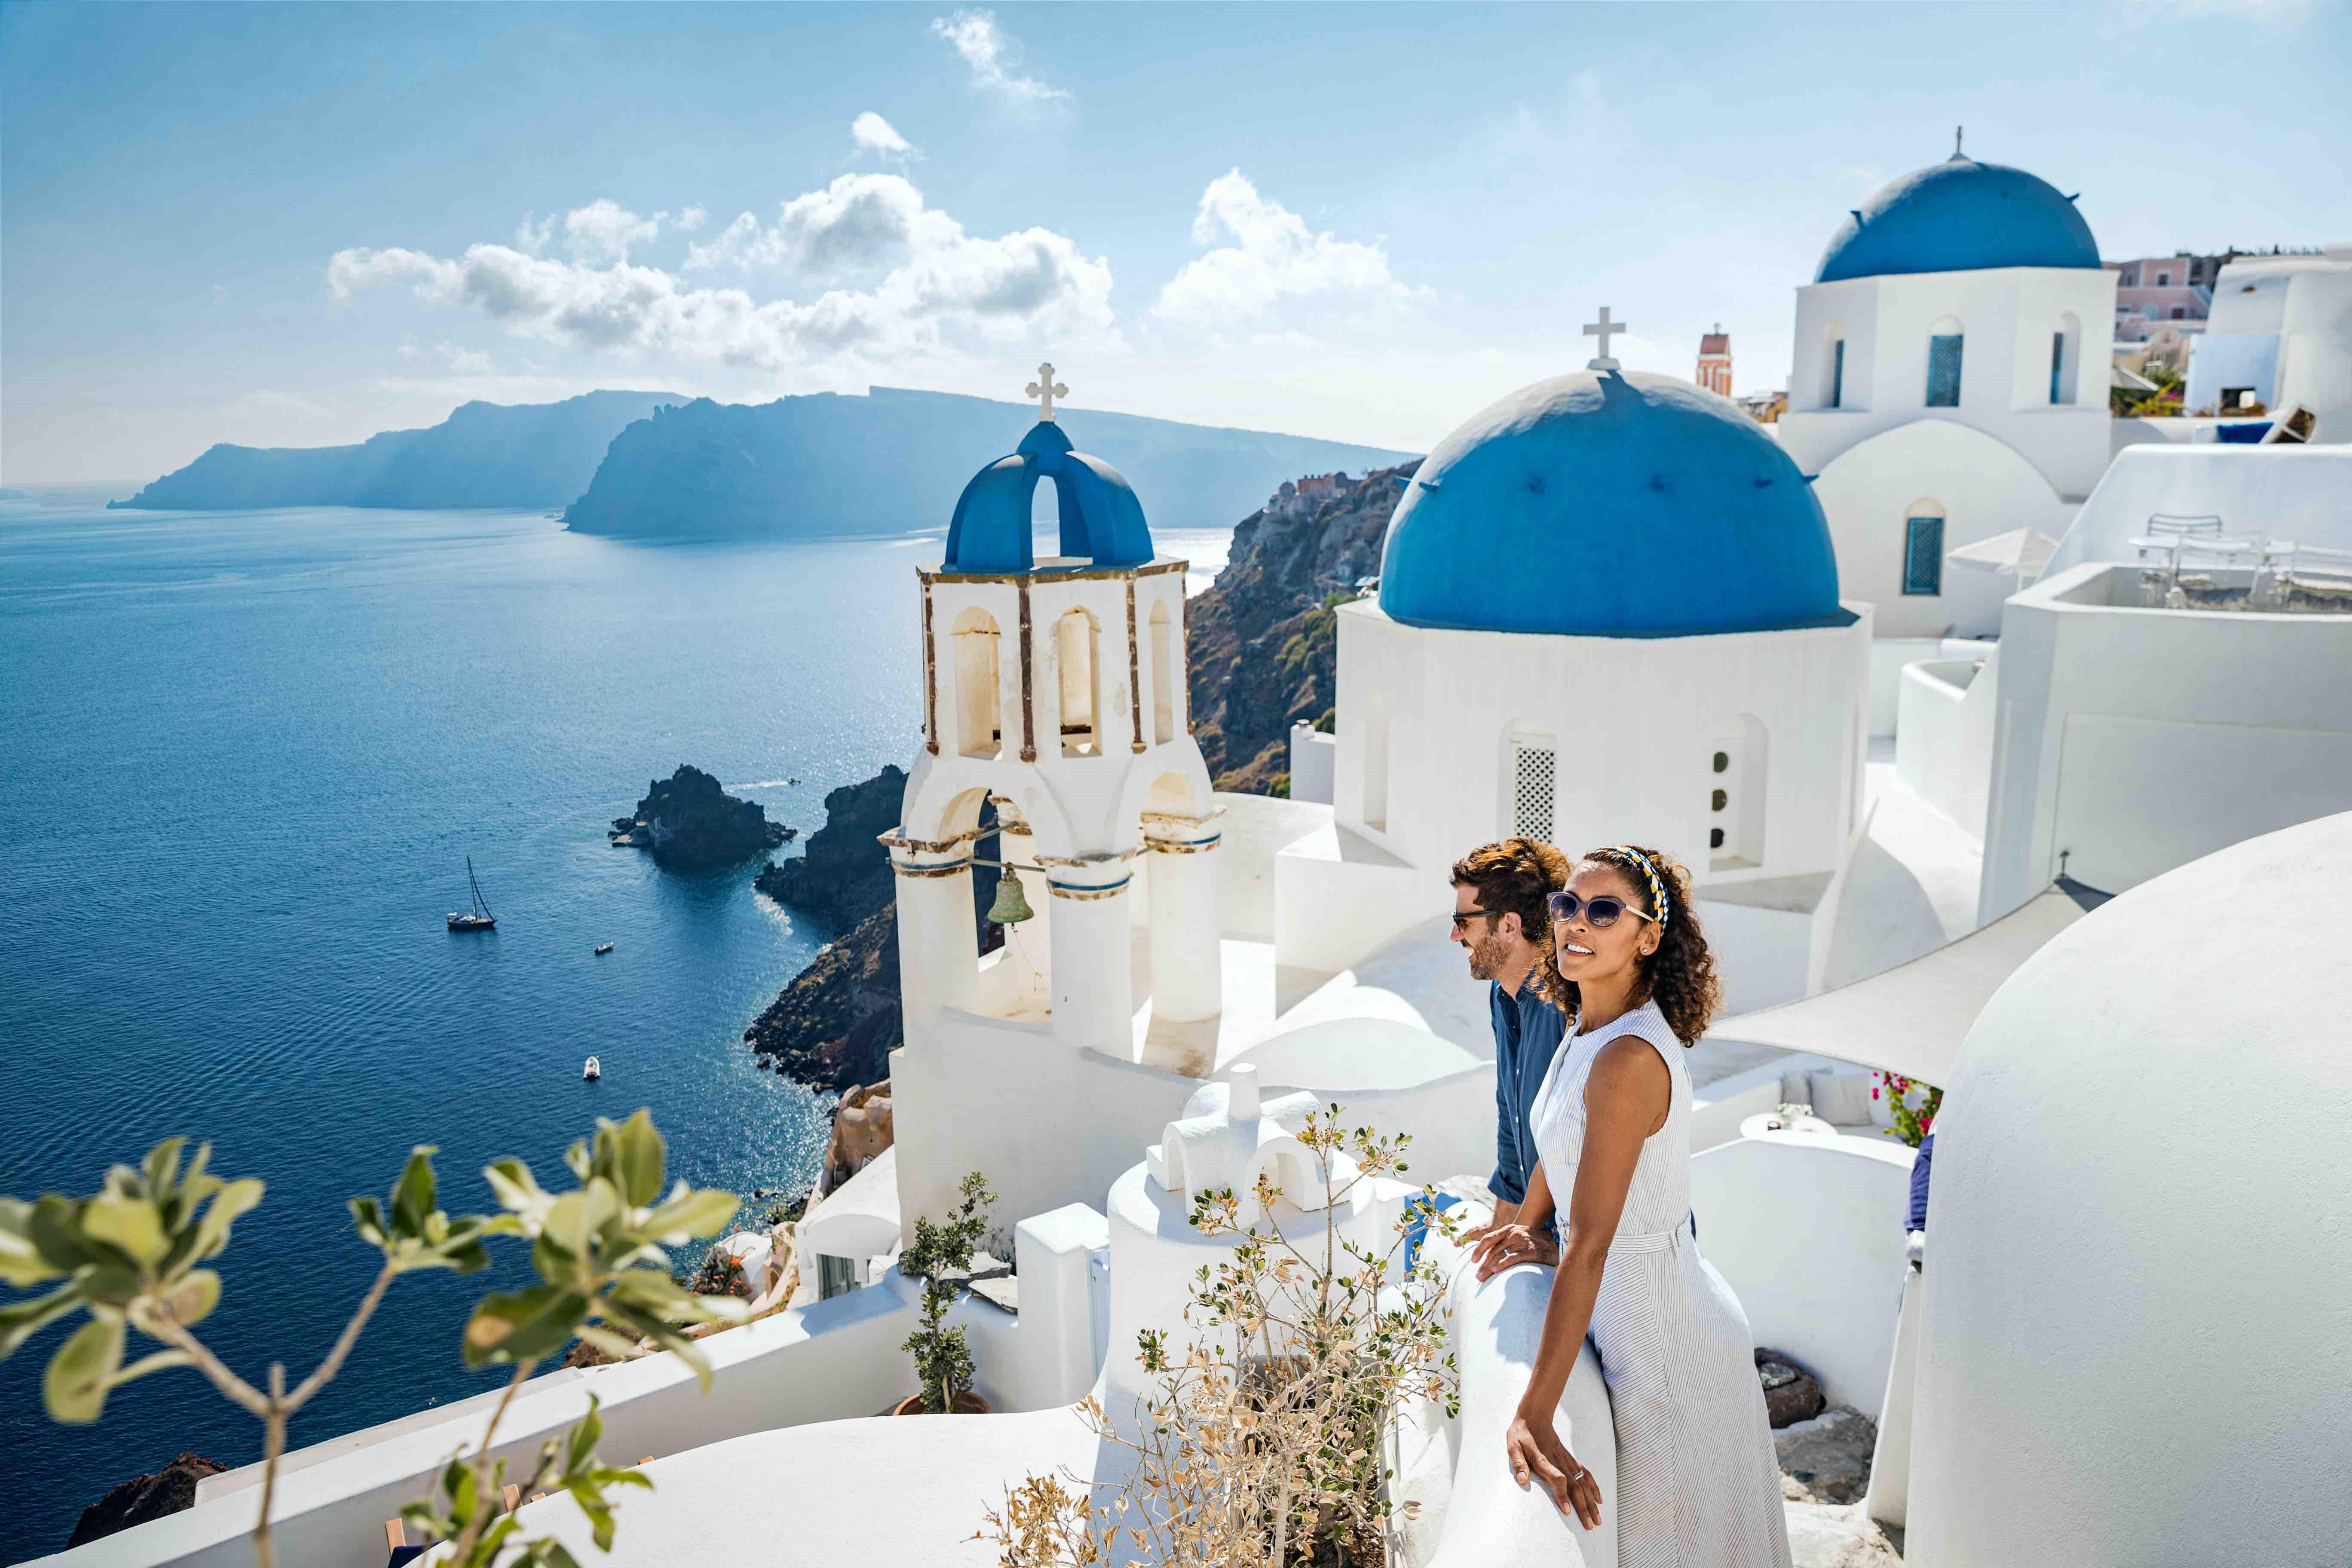 Les îles grecques seront accessibles dès le 25 juillet 2021 à bord du Norwegian Jade - Norwegian